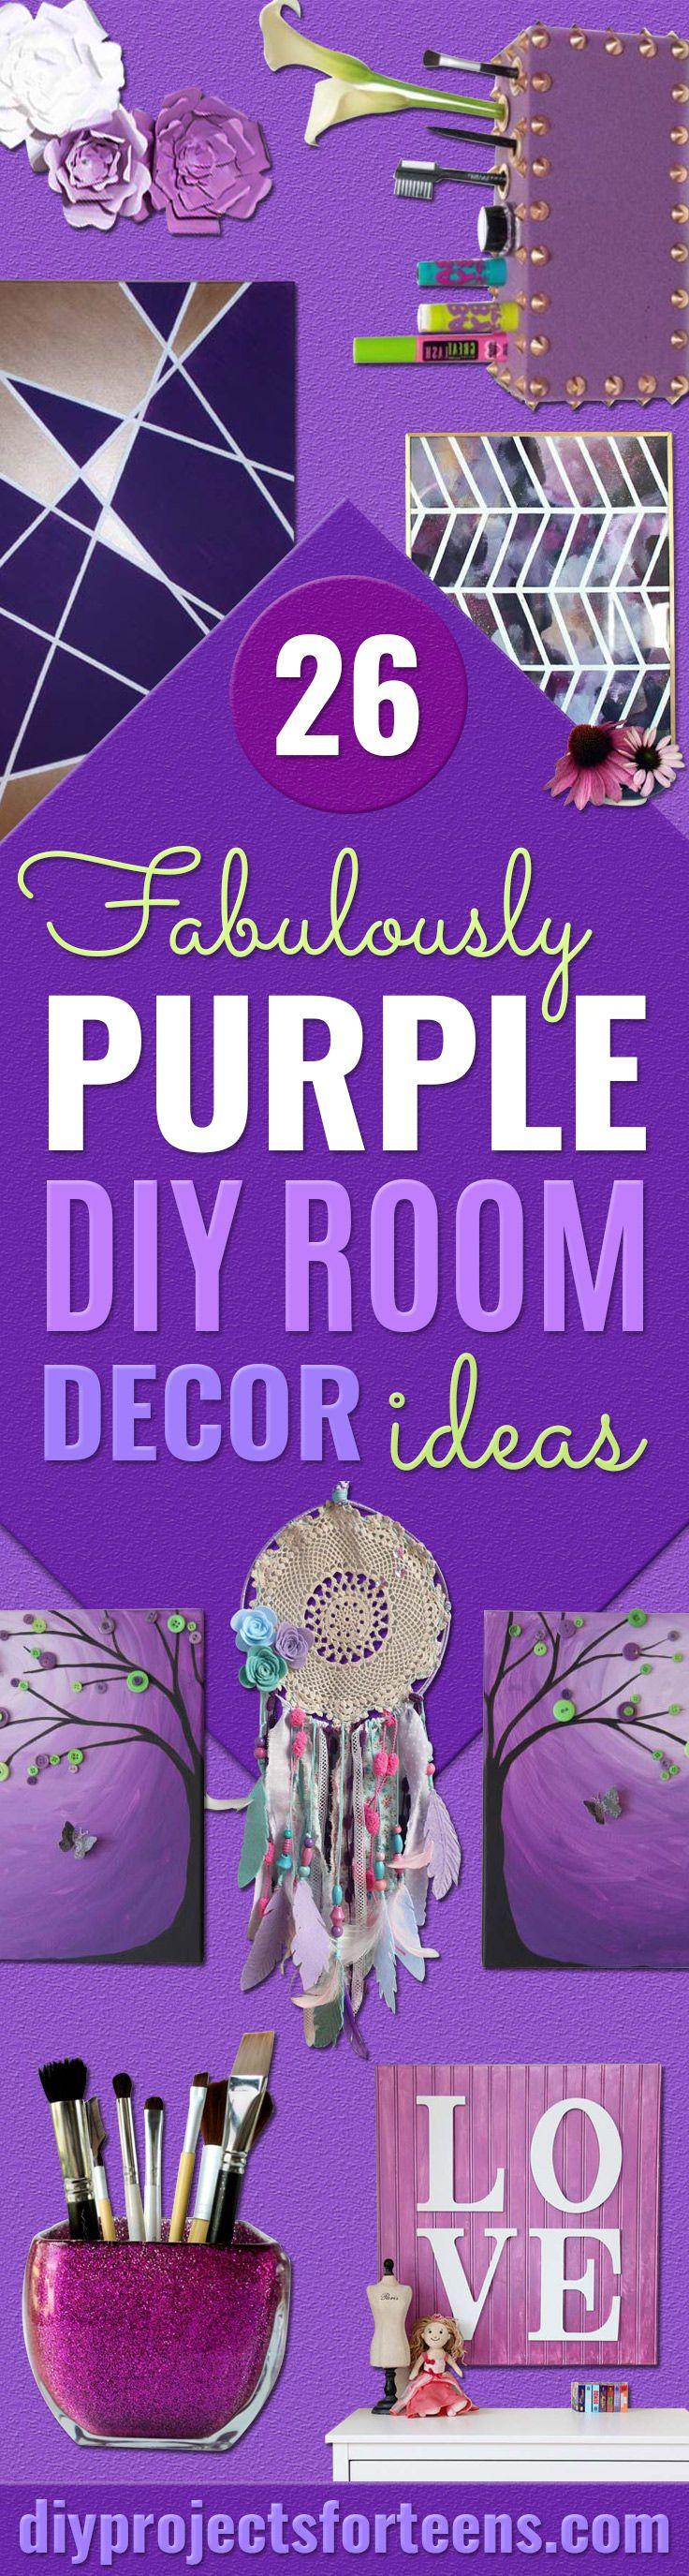 Purple Bedroom Decor 17 Best Ideas About Purple Room Decorations On Pinterest